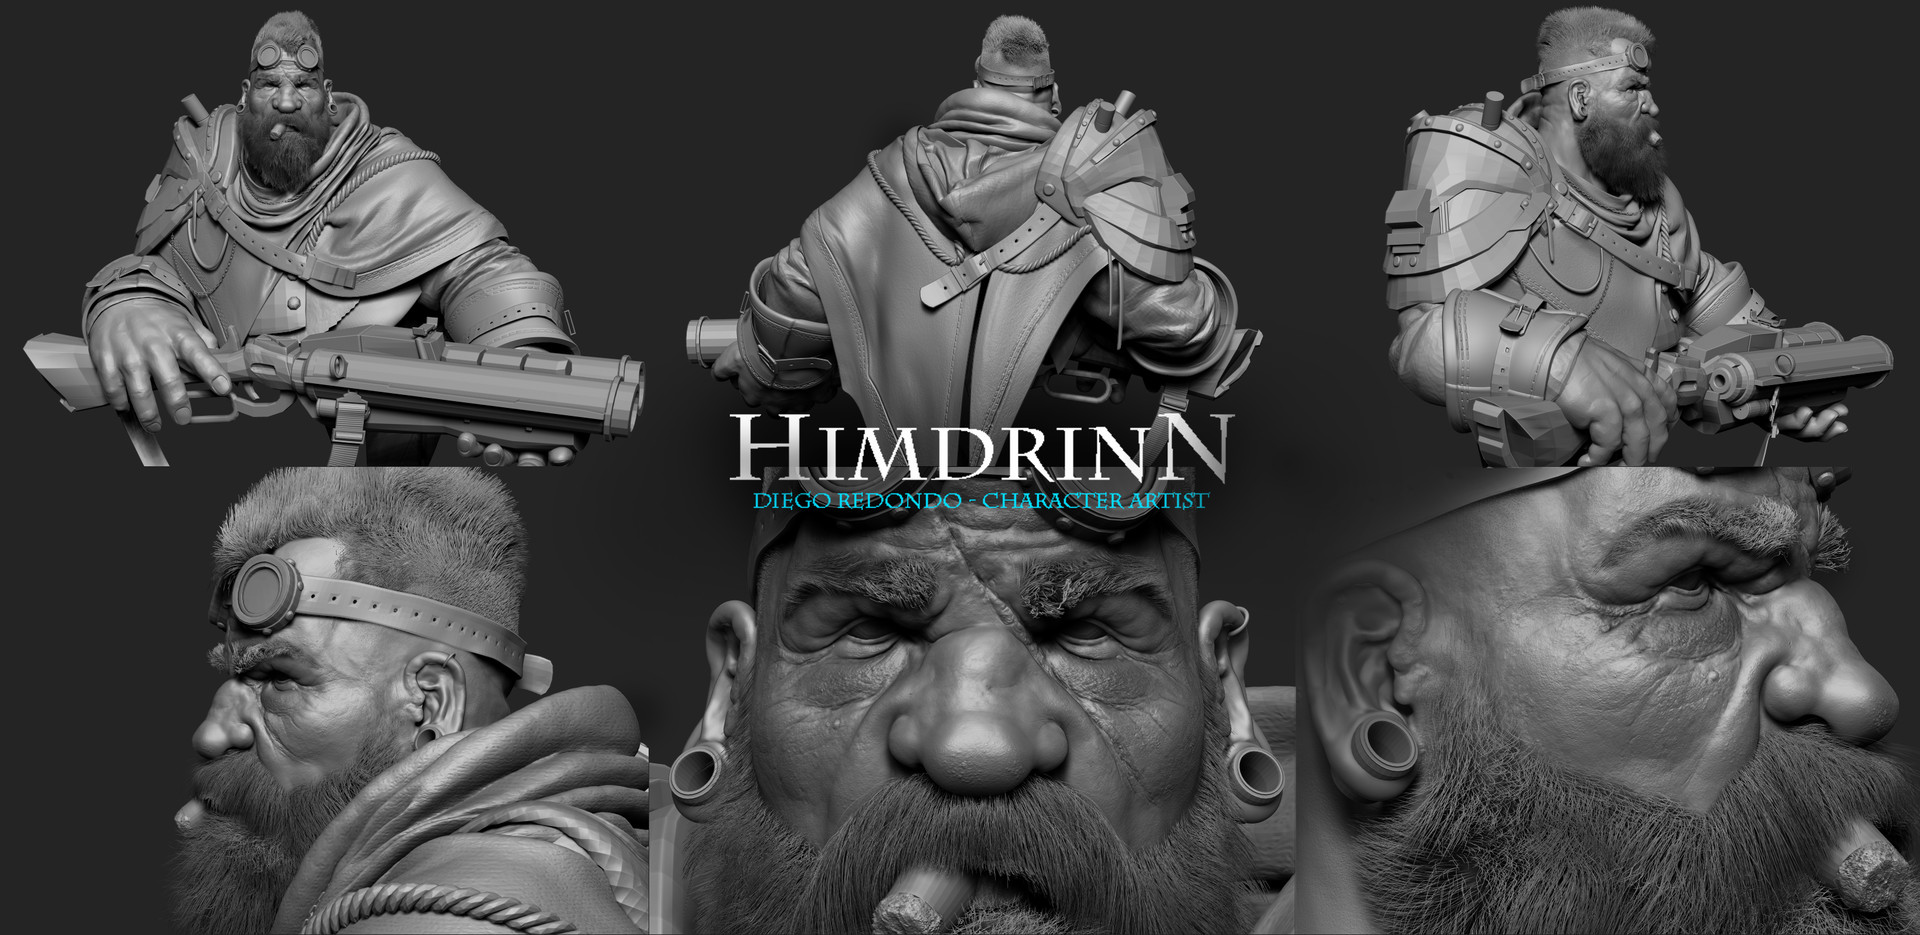 Himdrinn-diego-redondo-z.jpg